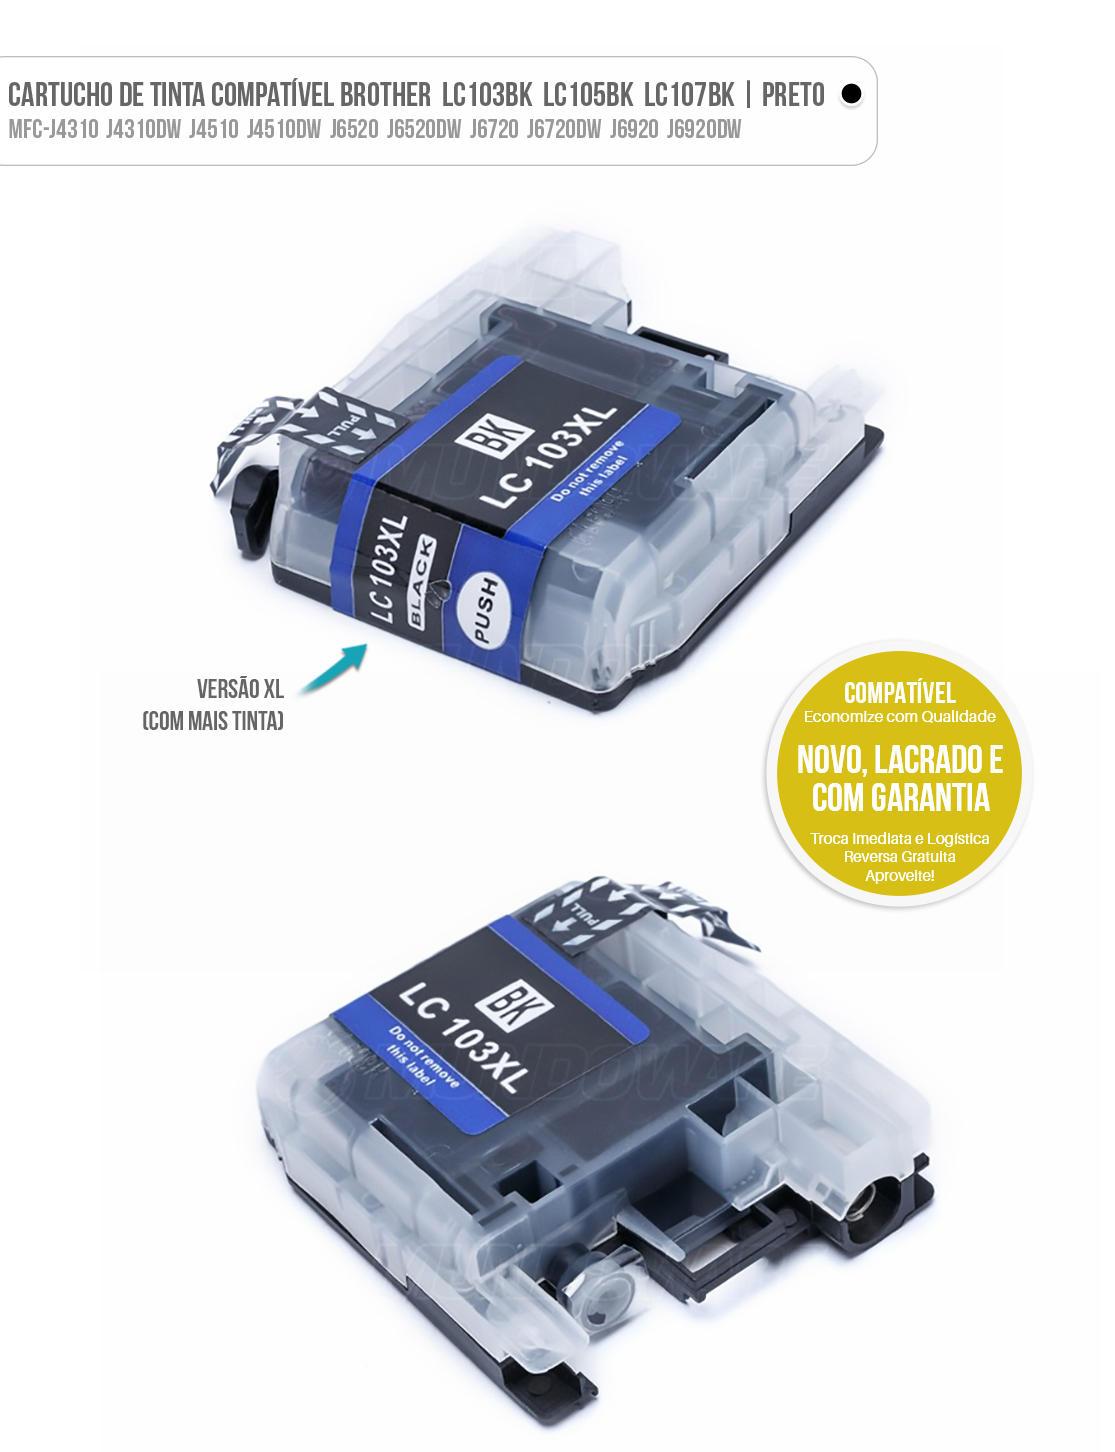 Cartucho de Tinta Compatível LC103 LC105 LC107 XL para Brother MFC-J4310DW J4610DW J6520DW J6720DW J6920 Preto